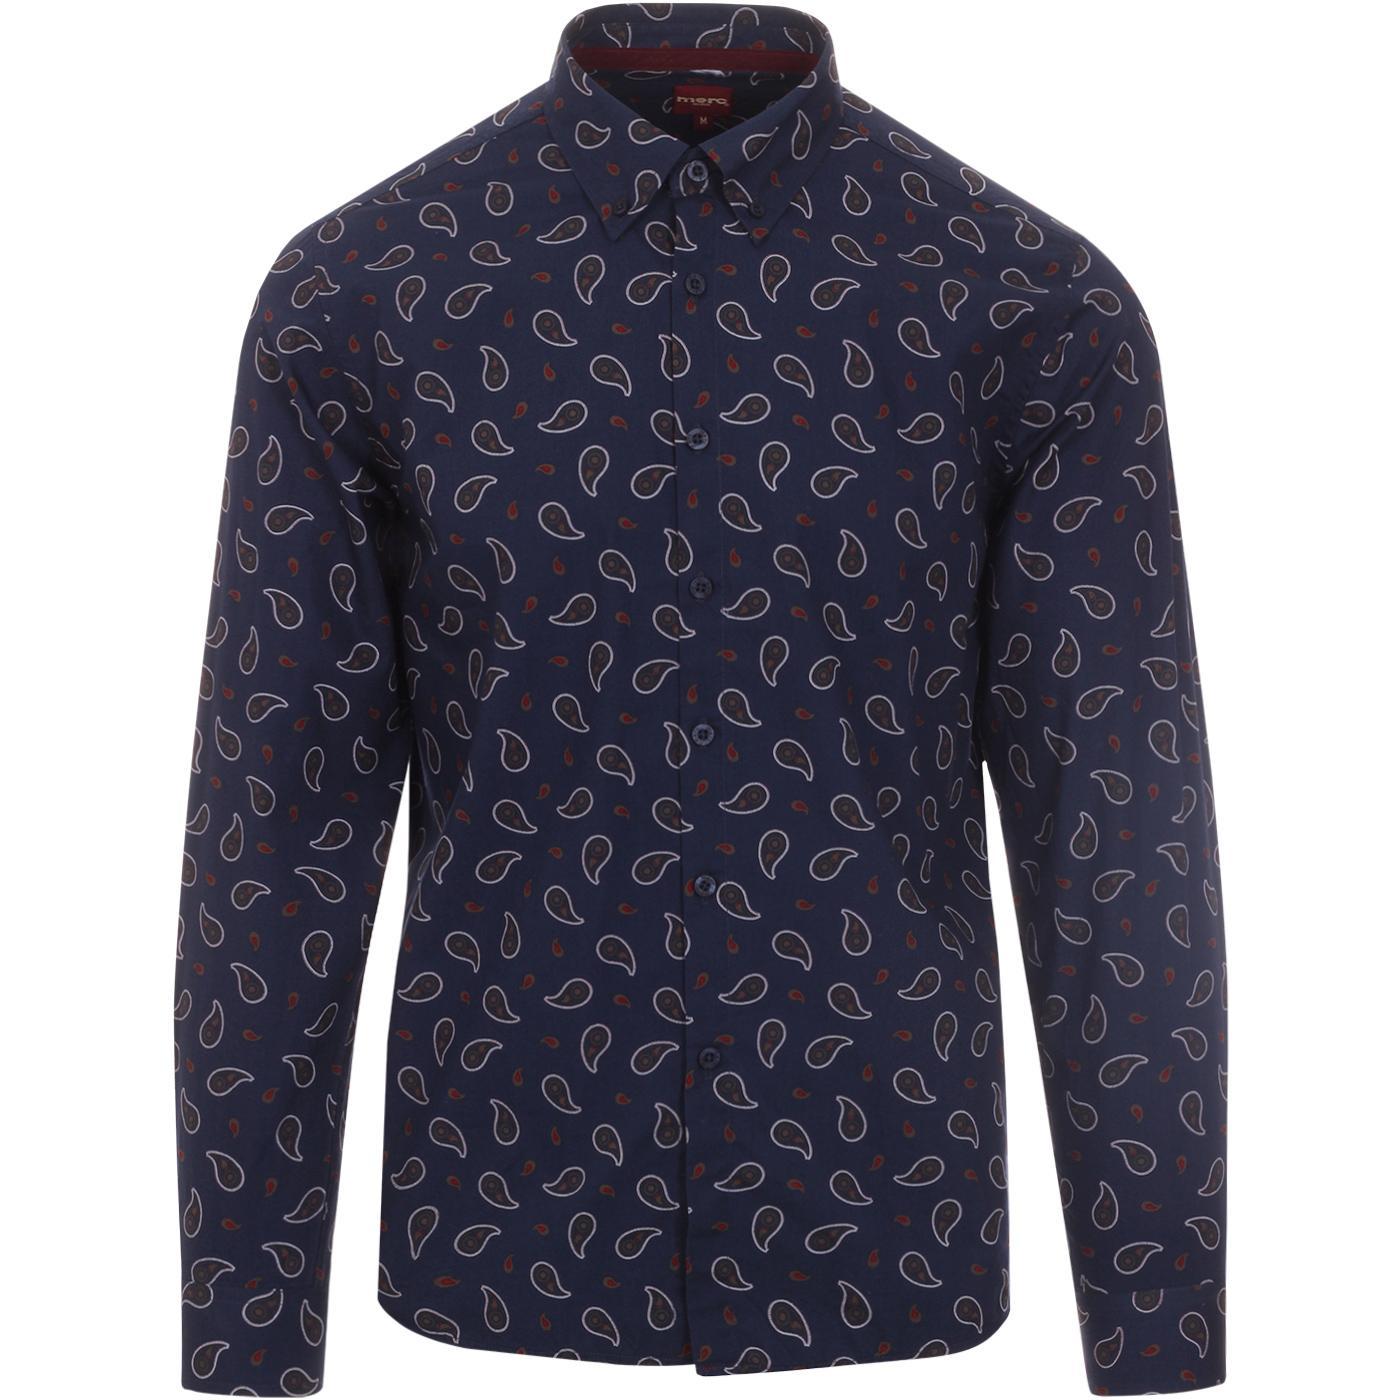 Endell MERC Mod Paisley Print Button Down Shirt N